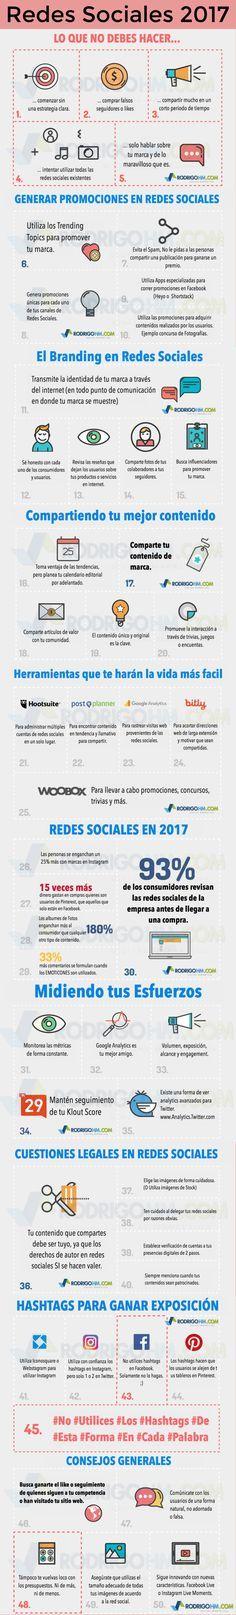 Redes Sociales 2017 #infografia